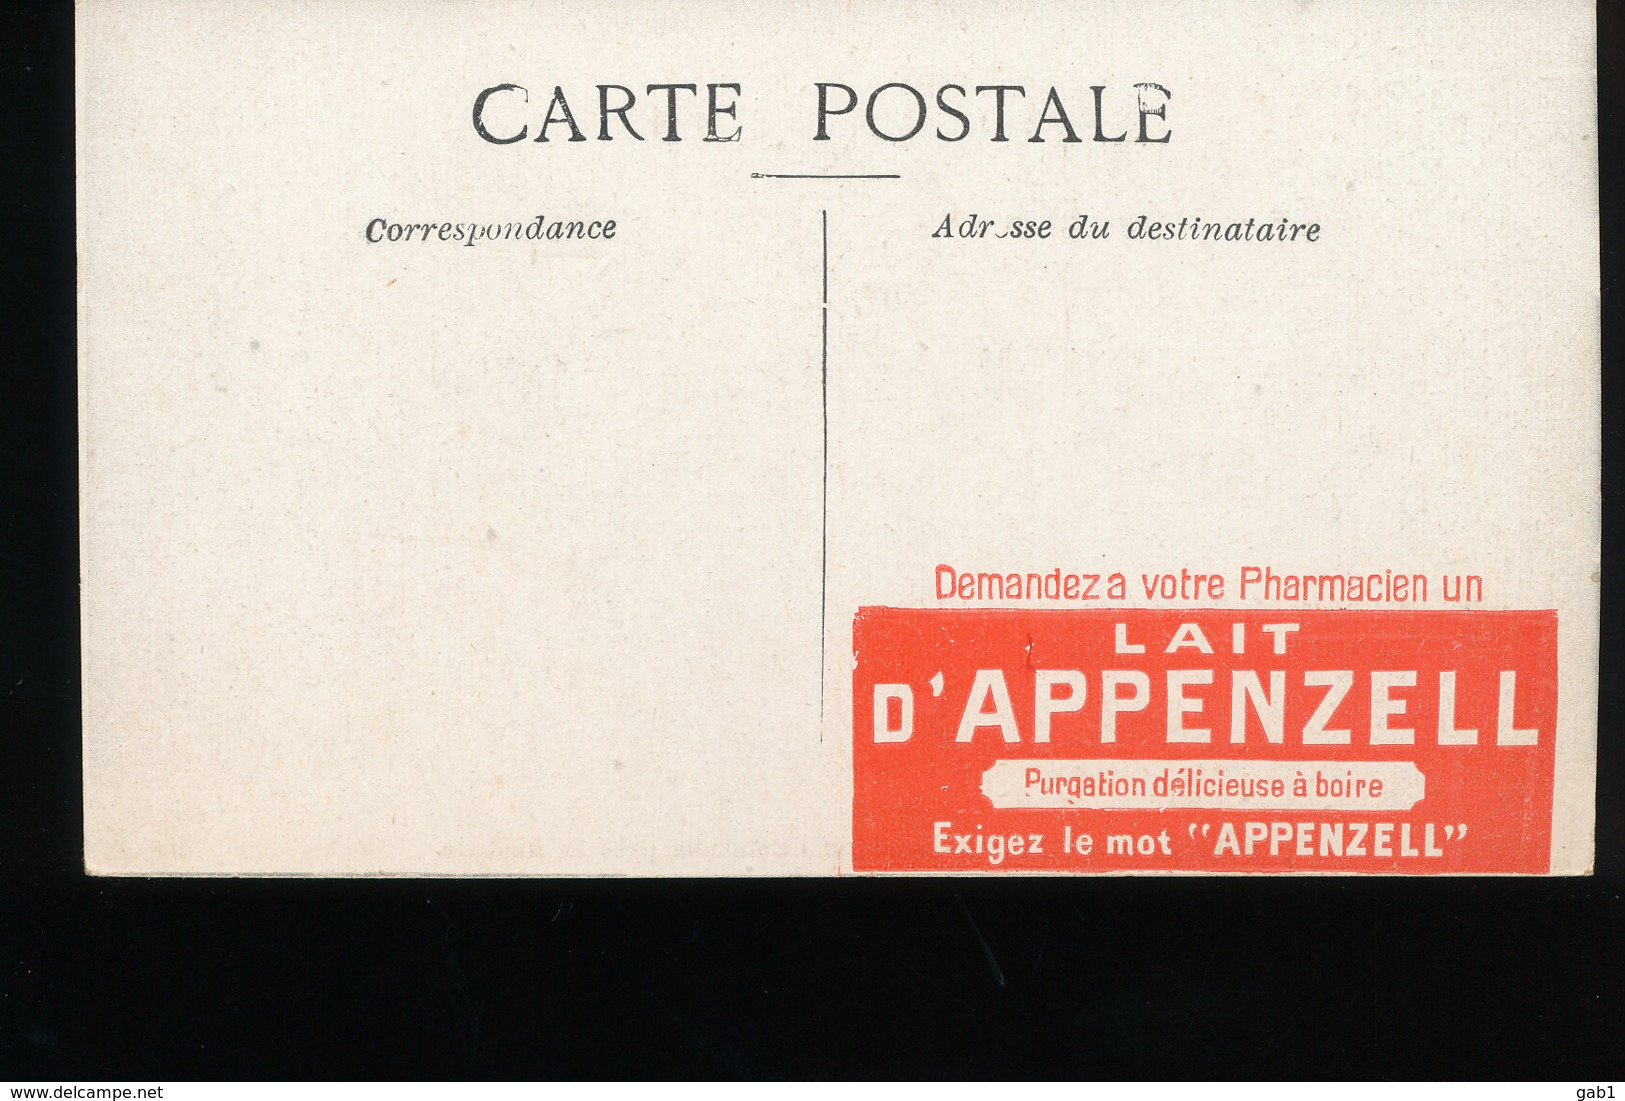 75 -- Paris Inonde -- Ambulance Automobile - Inondations De 1910